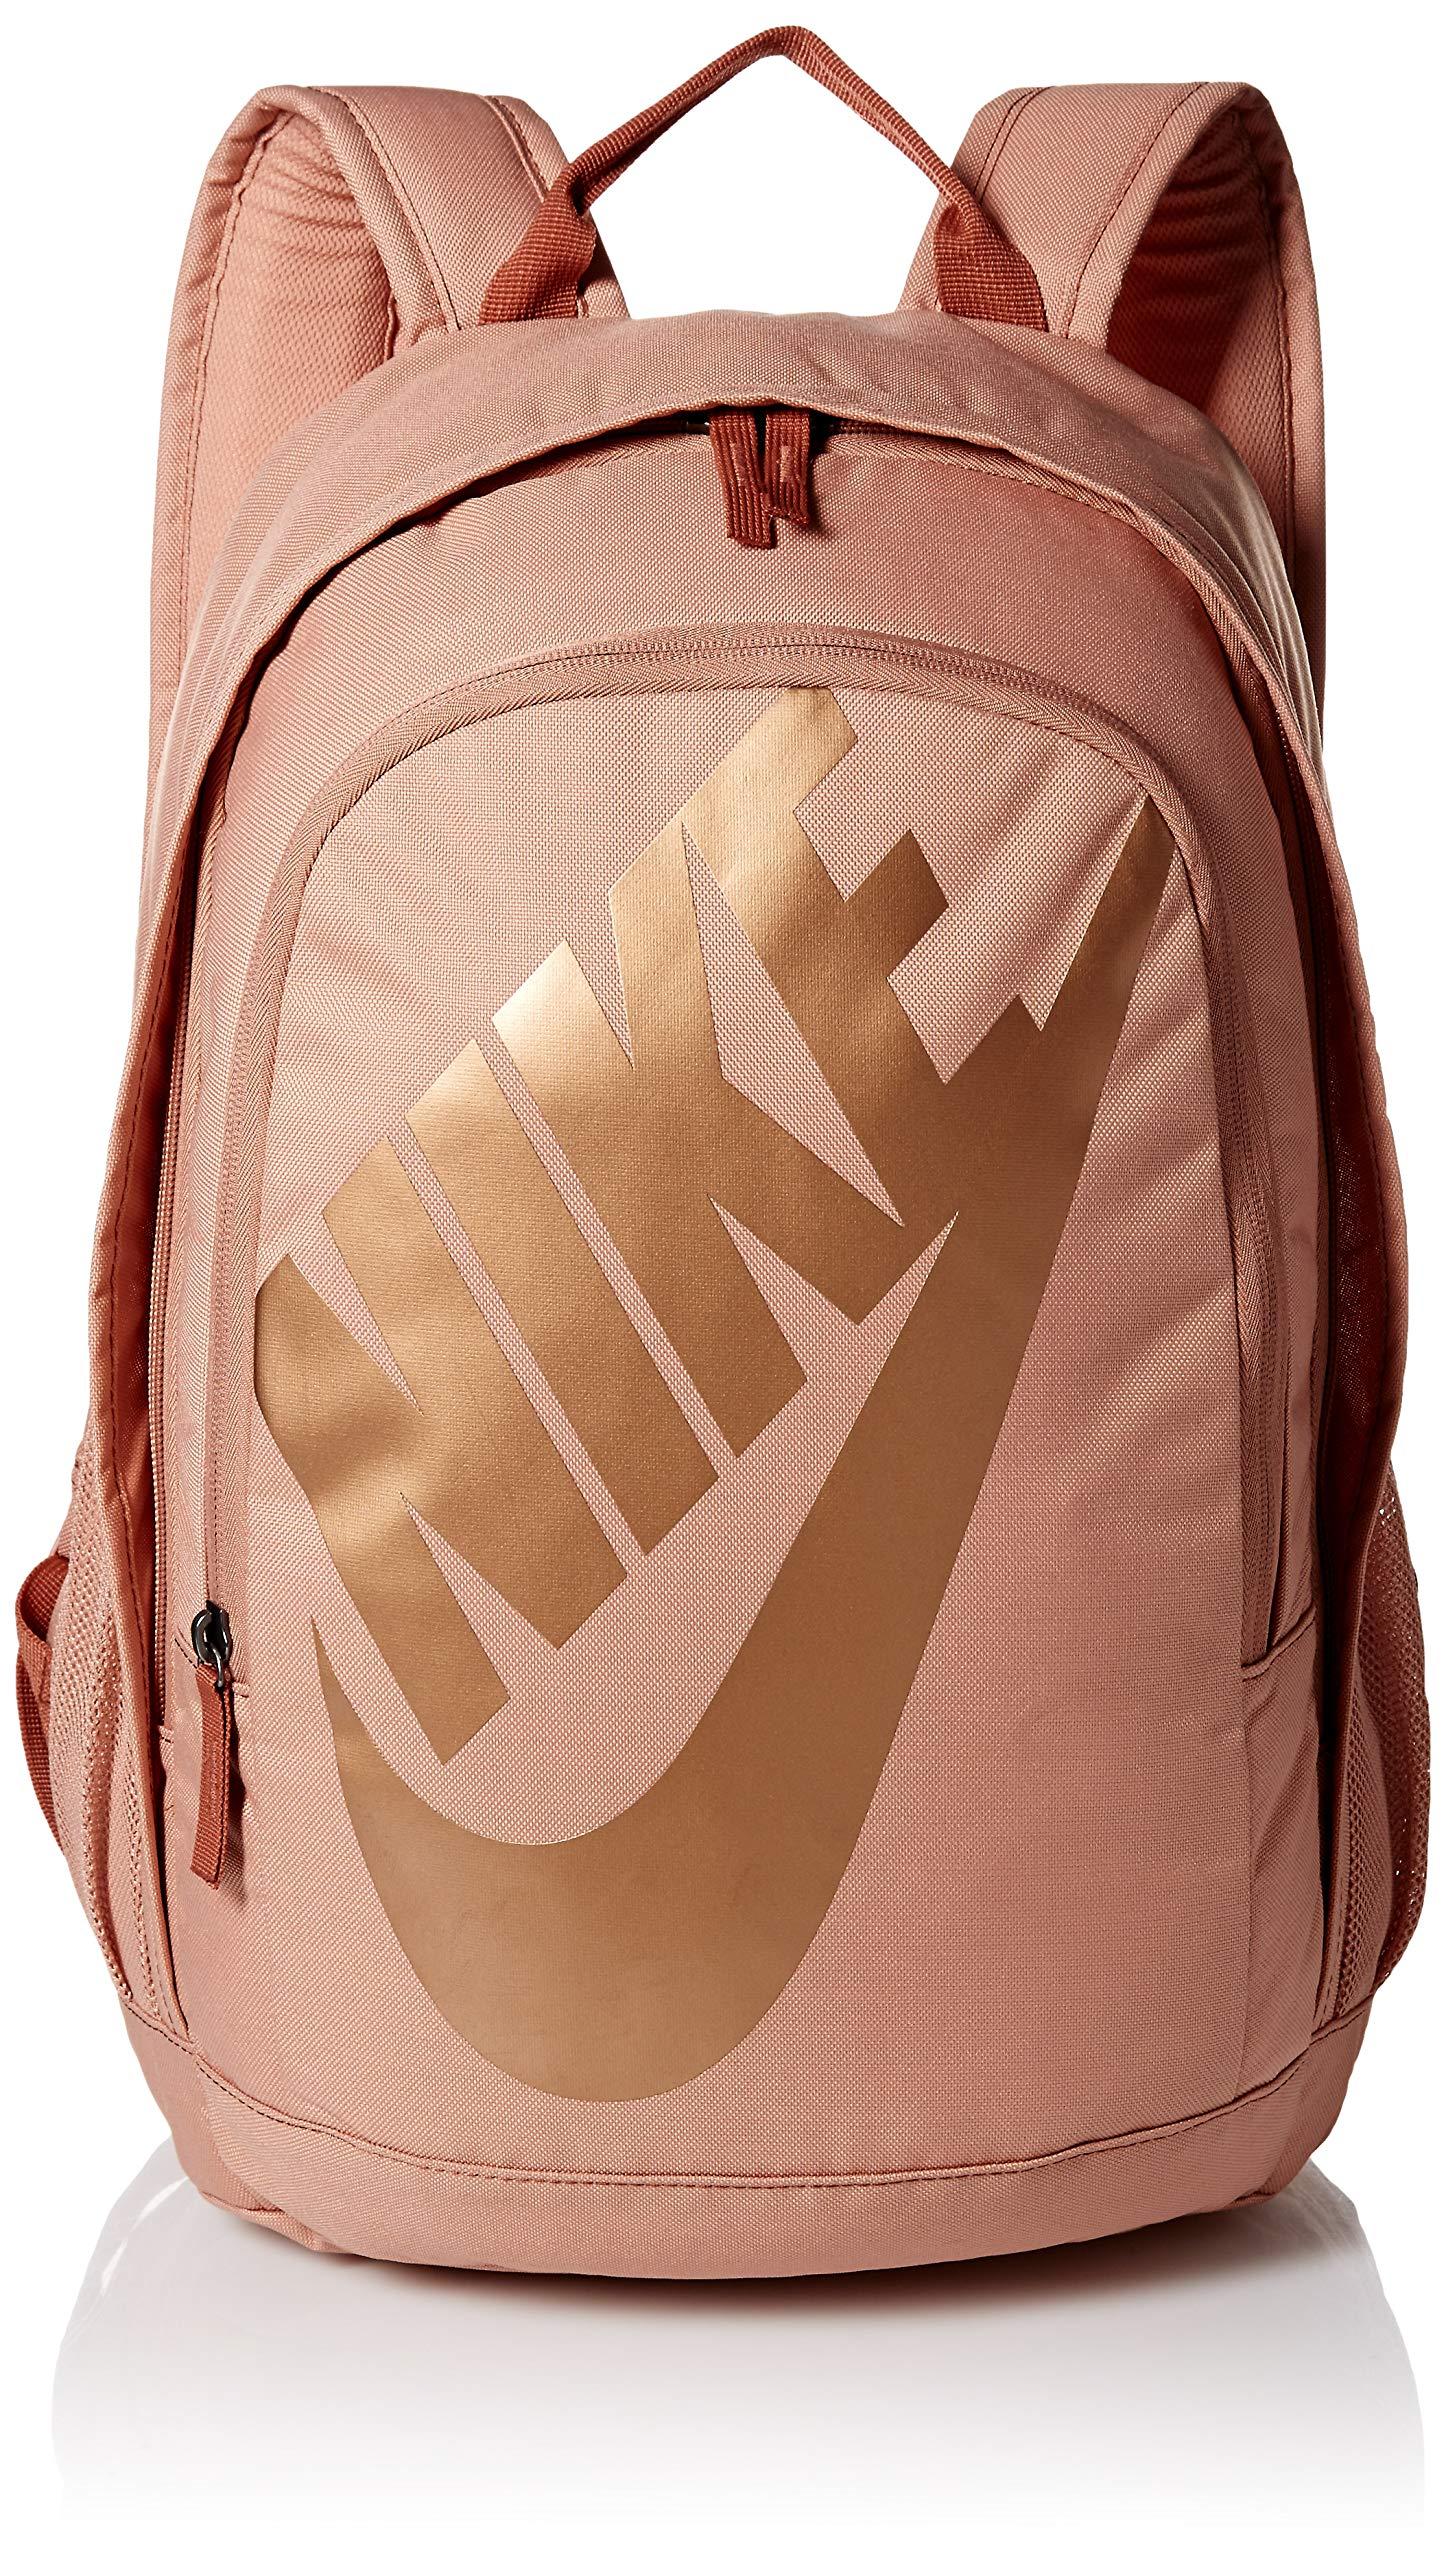 Eliminar A escala nacional motivo  bultos escolares nike Cheaper Than Retail Price> Buy Clothing, Accessories  and lifestyle products for women & men -